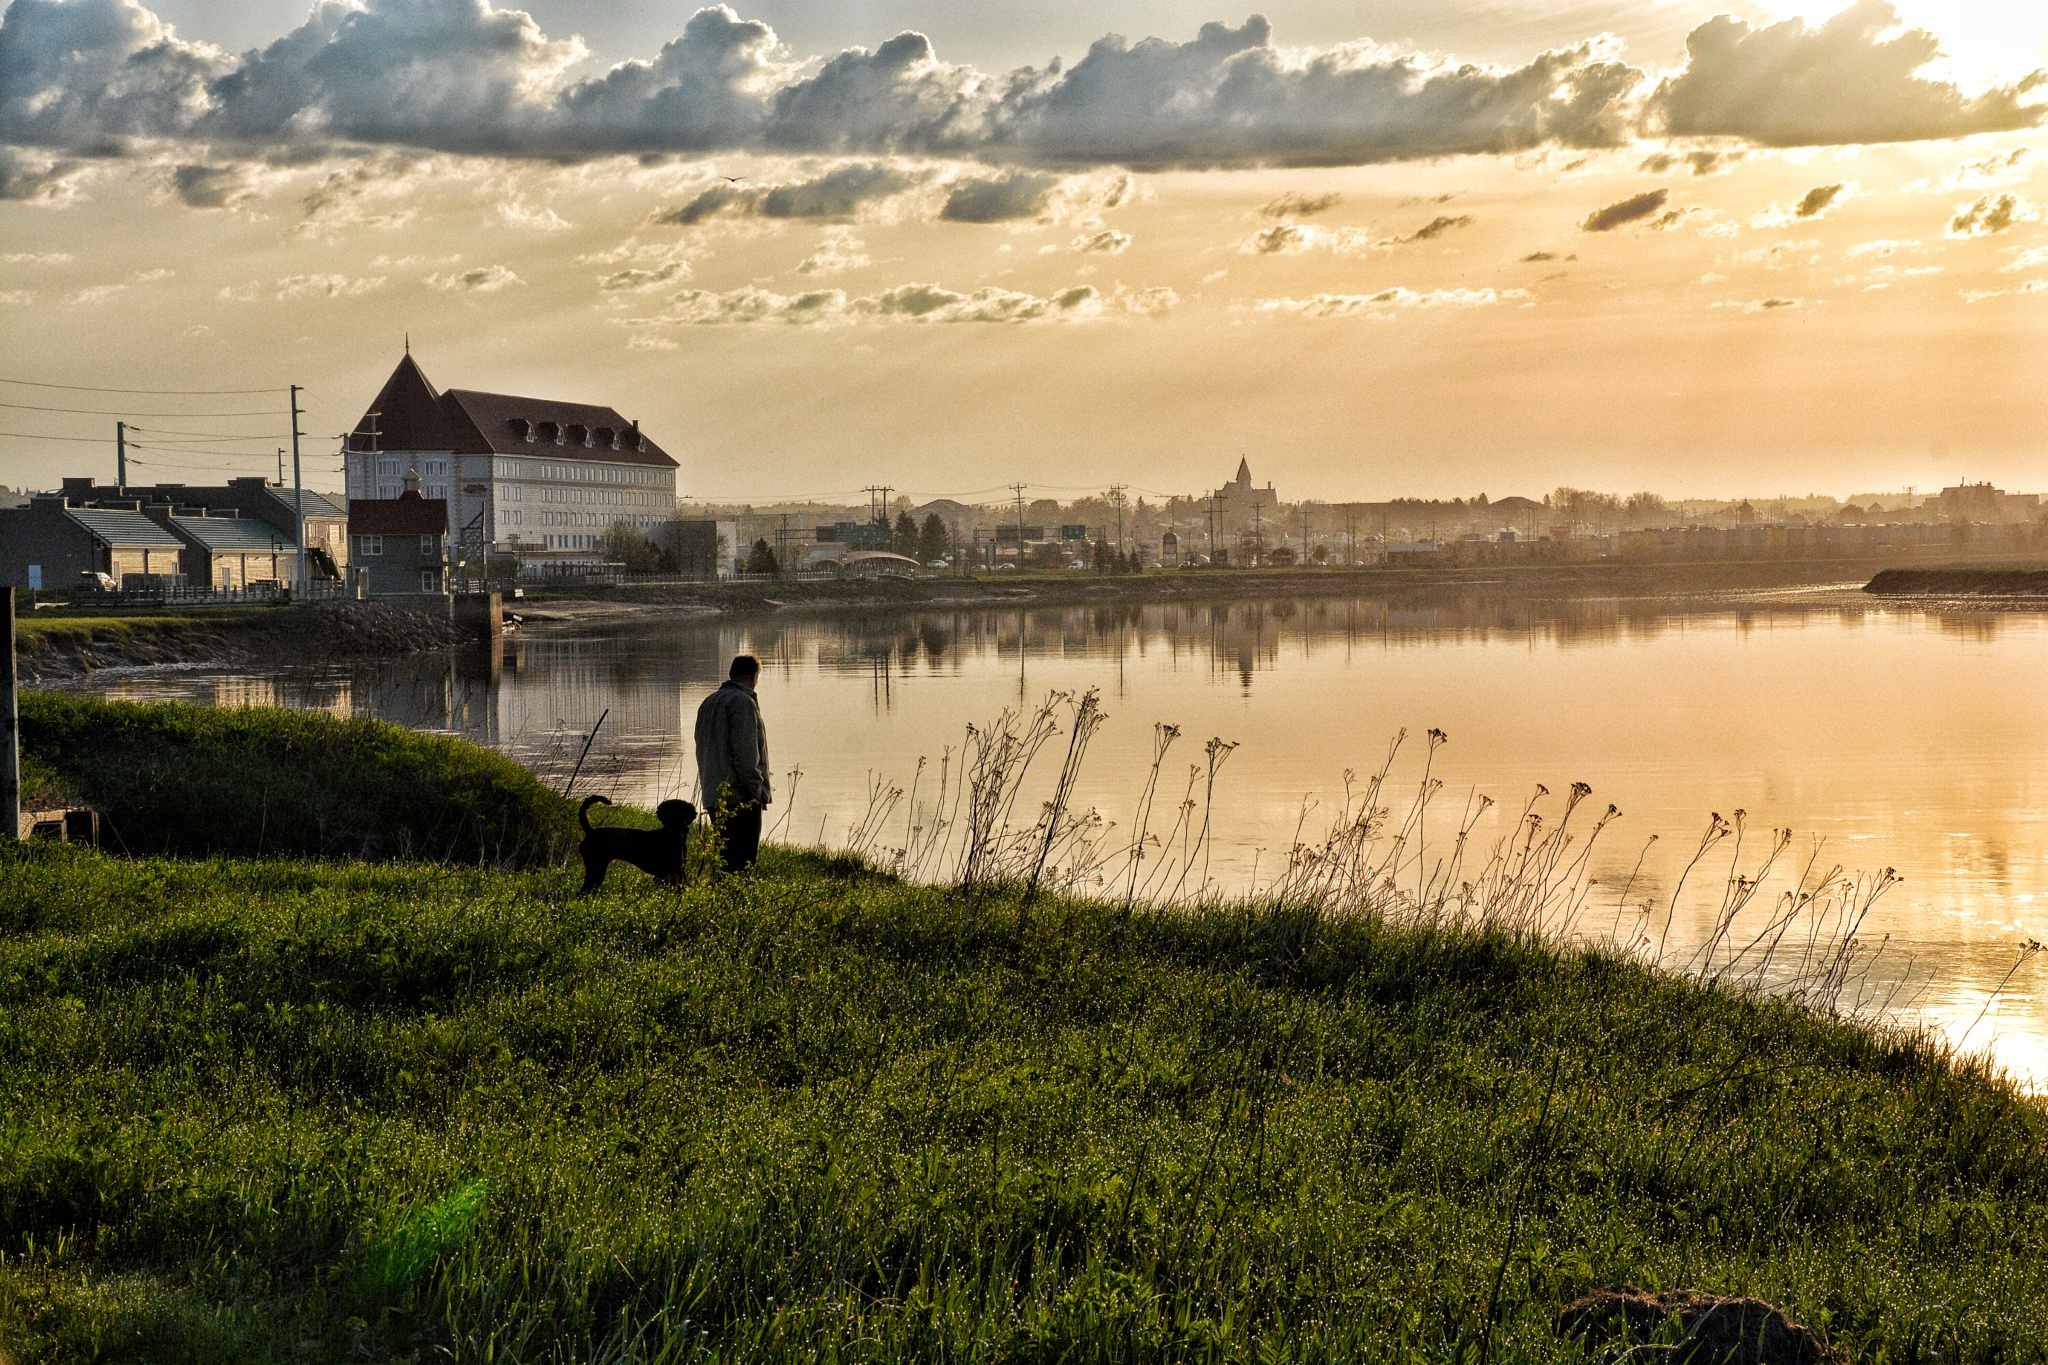 Sunrise on the Petitcodiac River by phototerroso